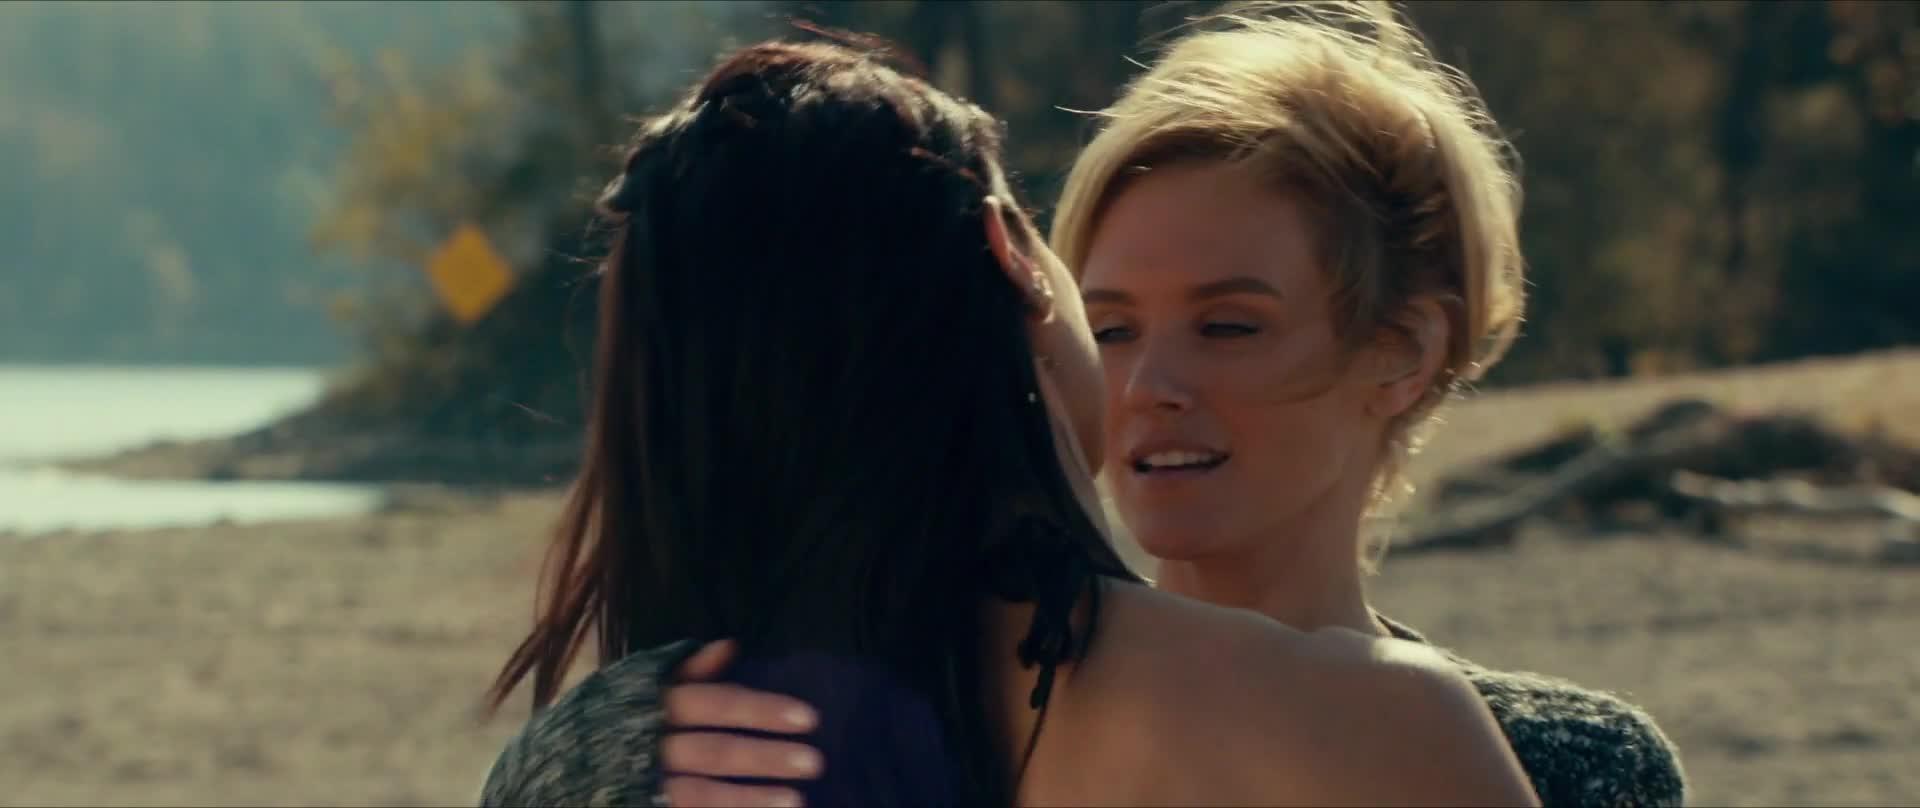 Eva Marie sexy scene in inconceivable ii